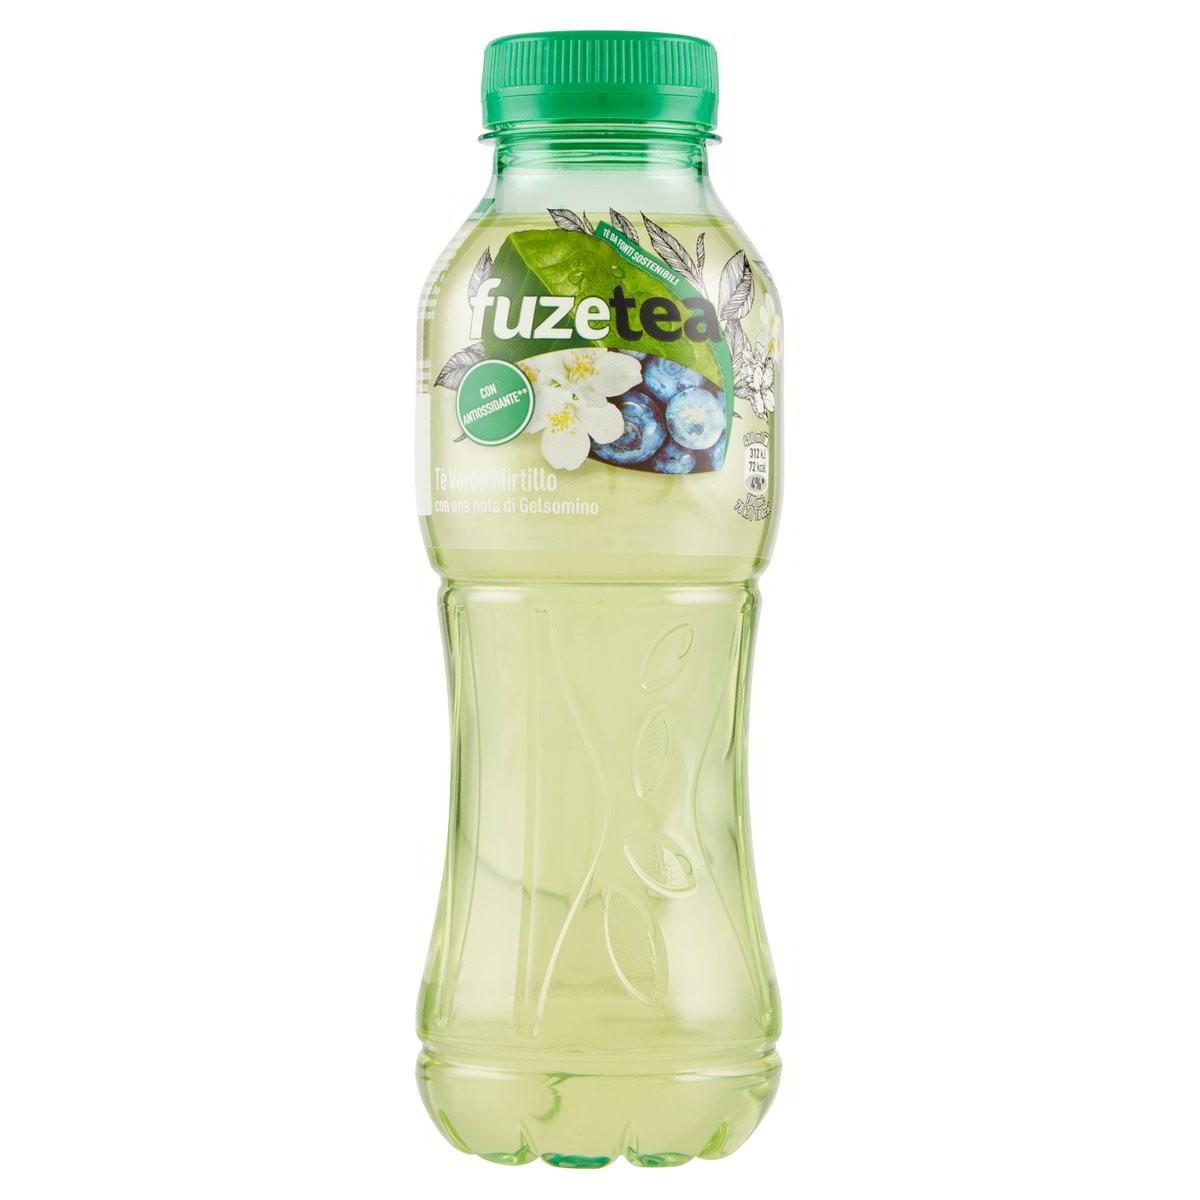 Fuzetea Tè Verde Mirtillo Con Gelsomino